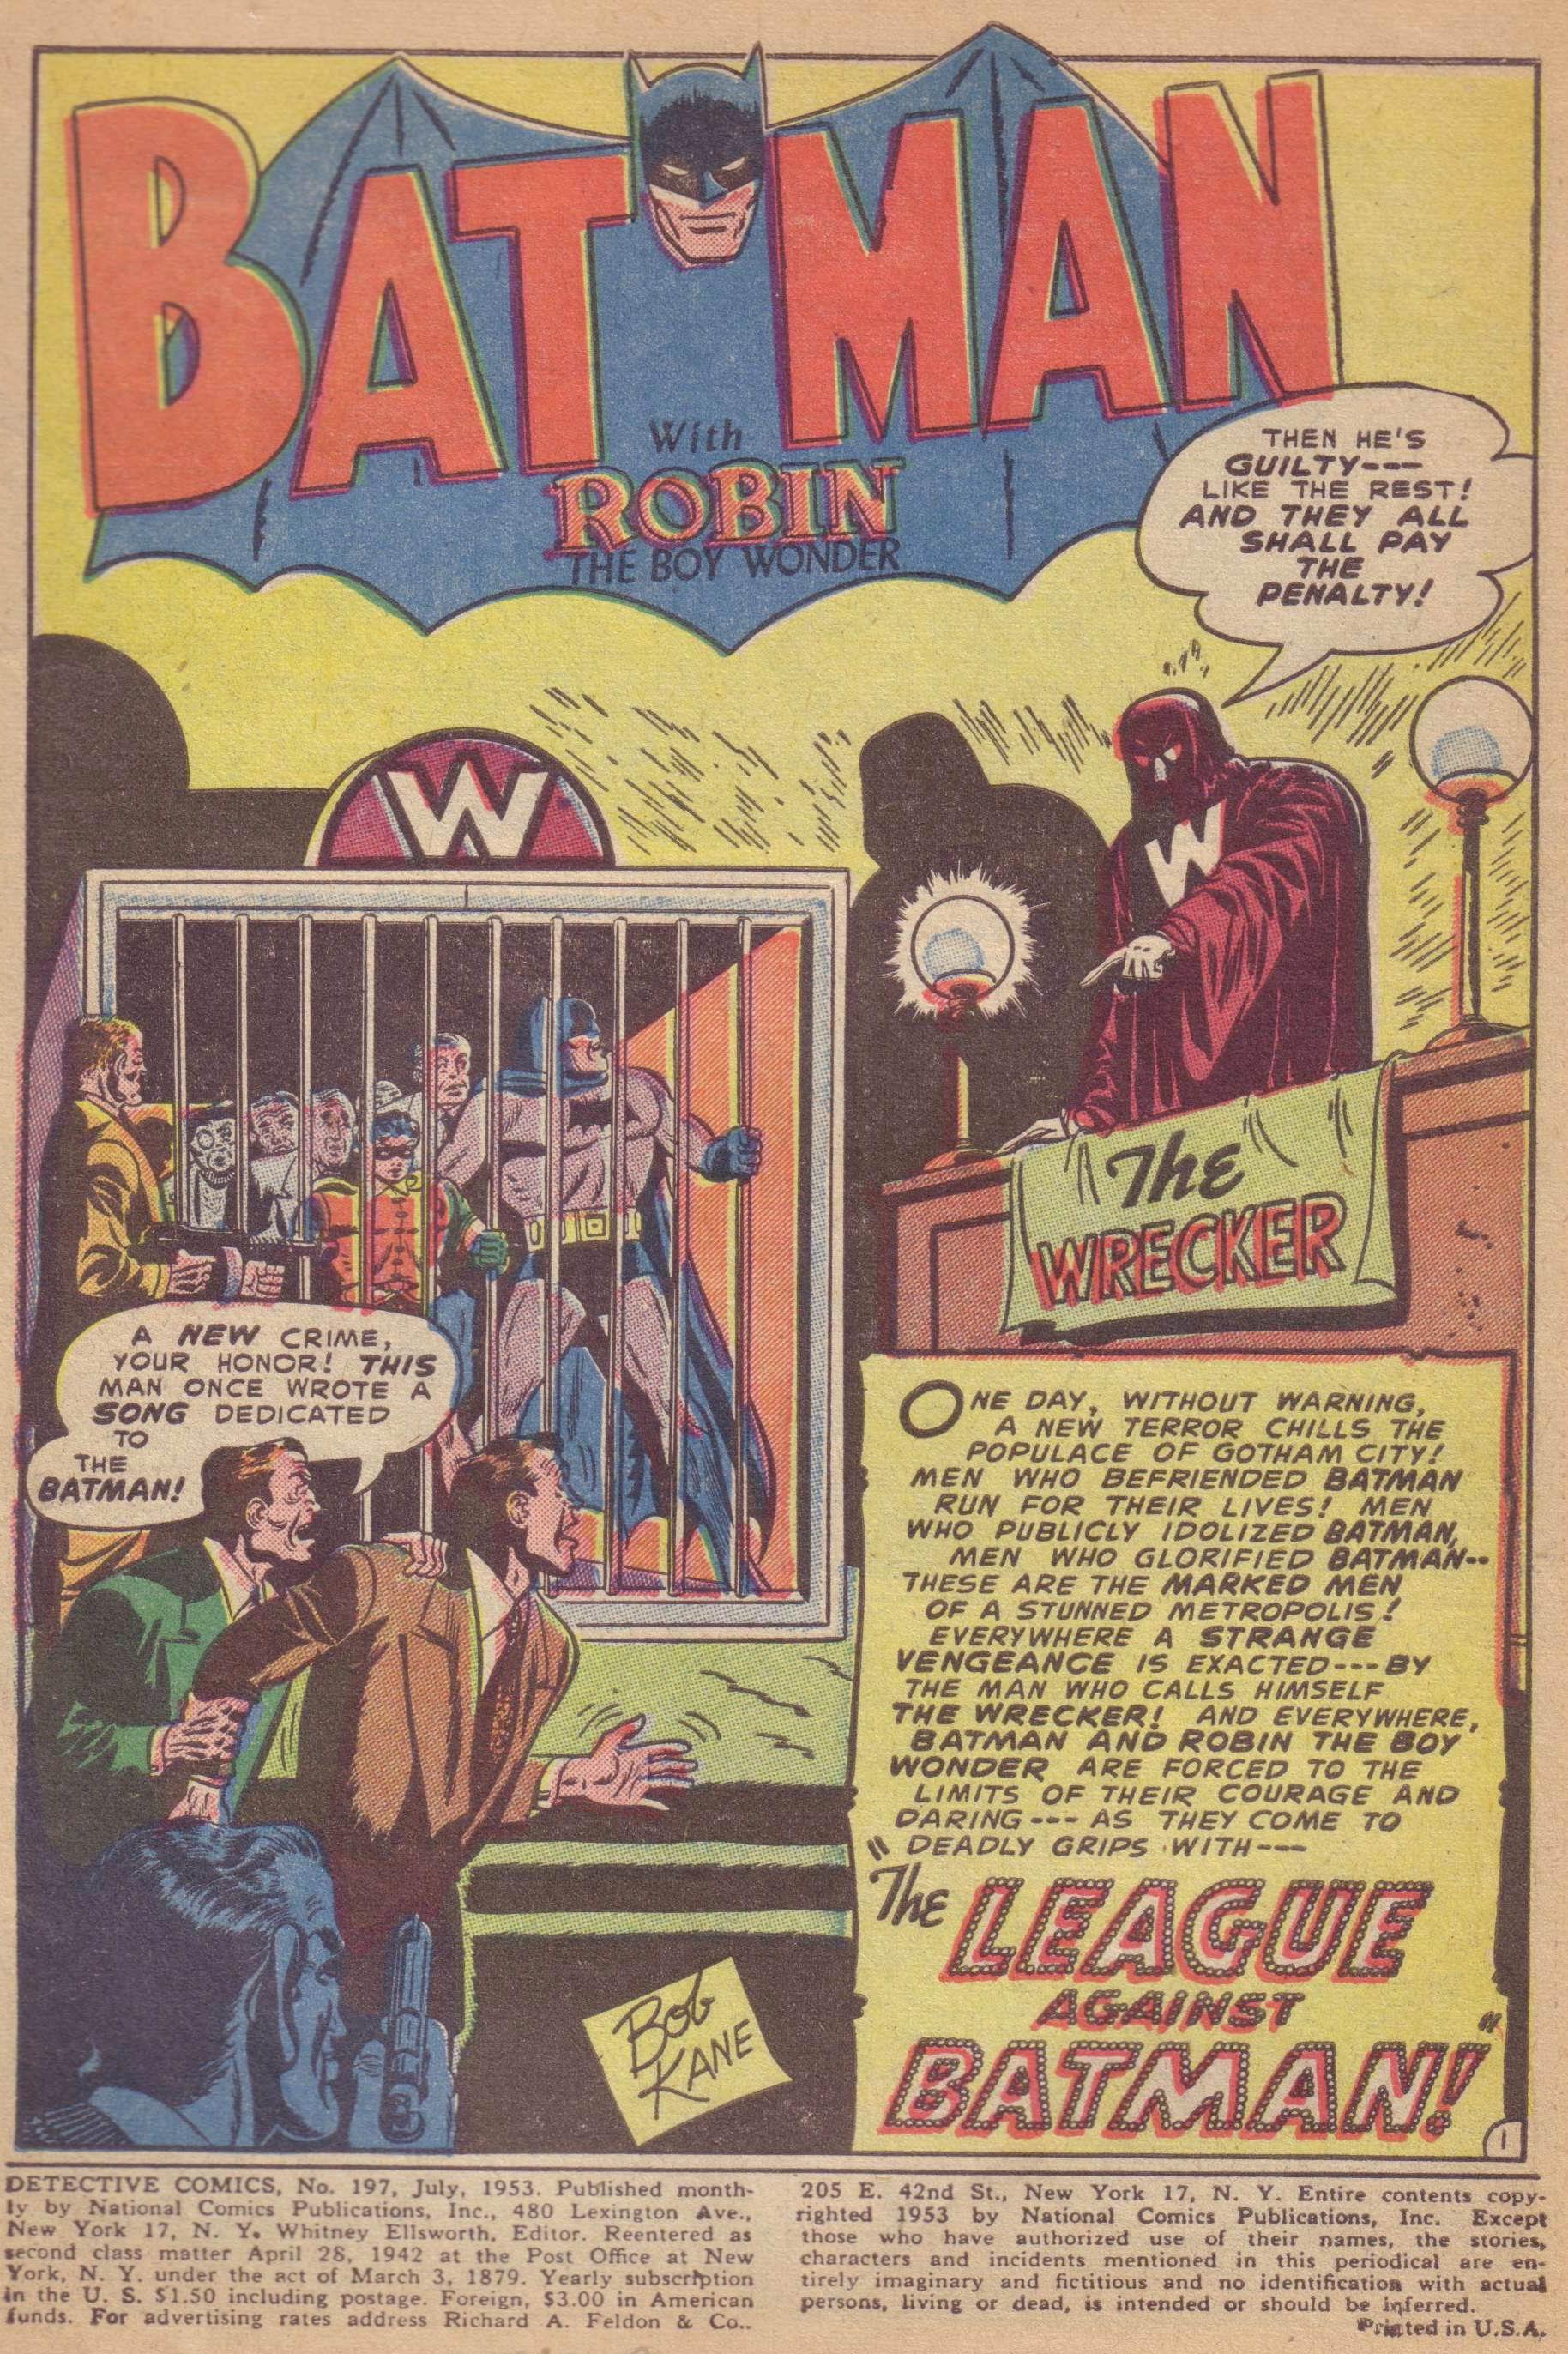 Read online Detective Comics (1937) comic -  Issue #197 - 3